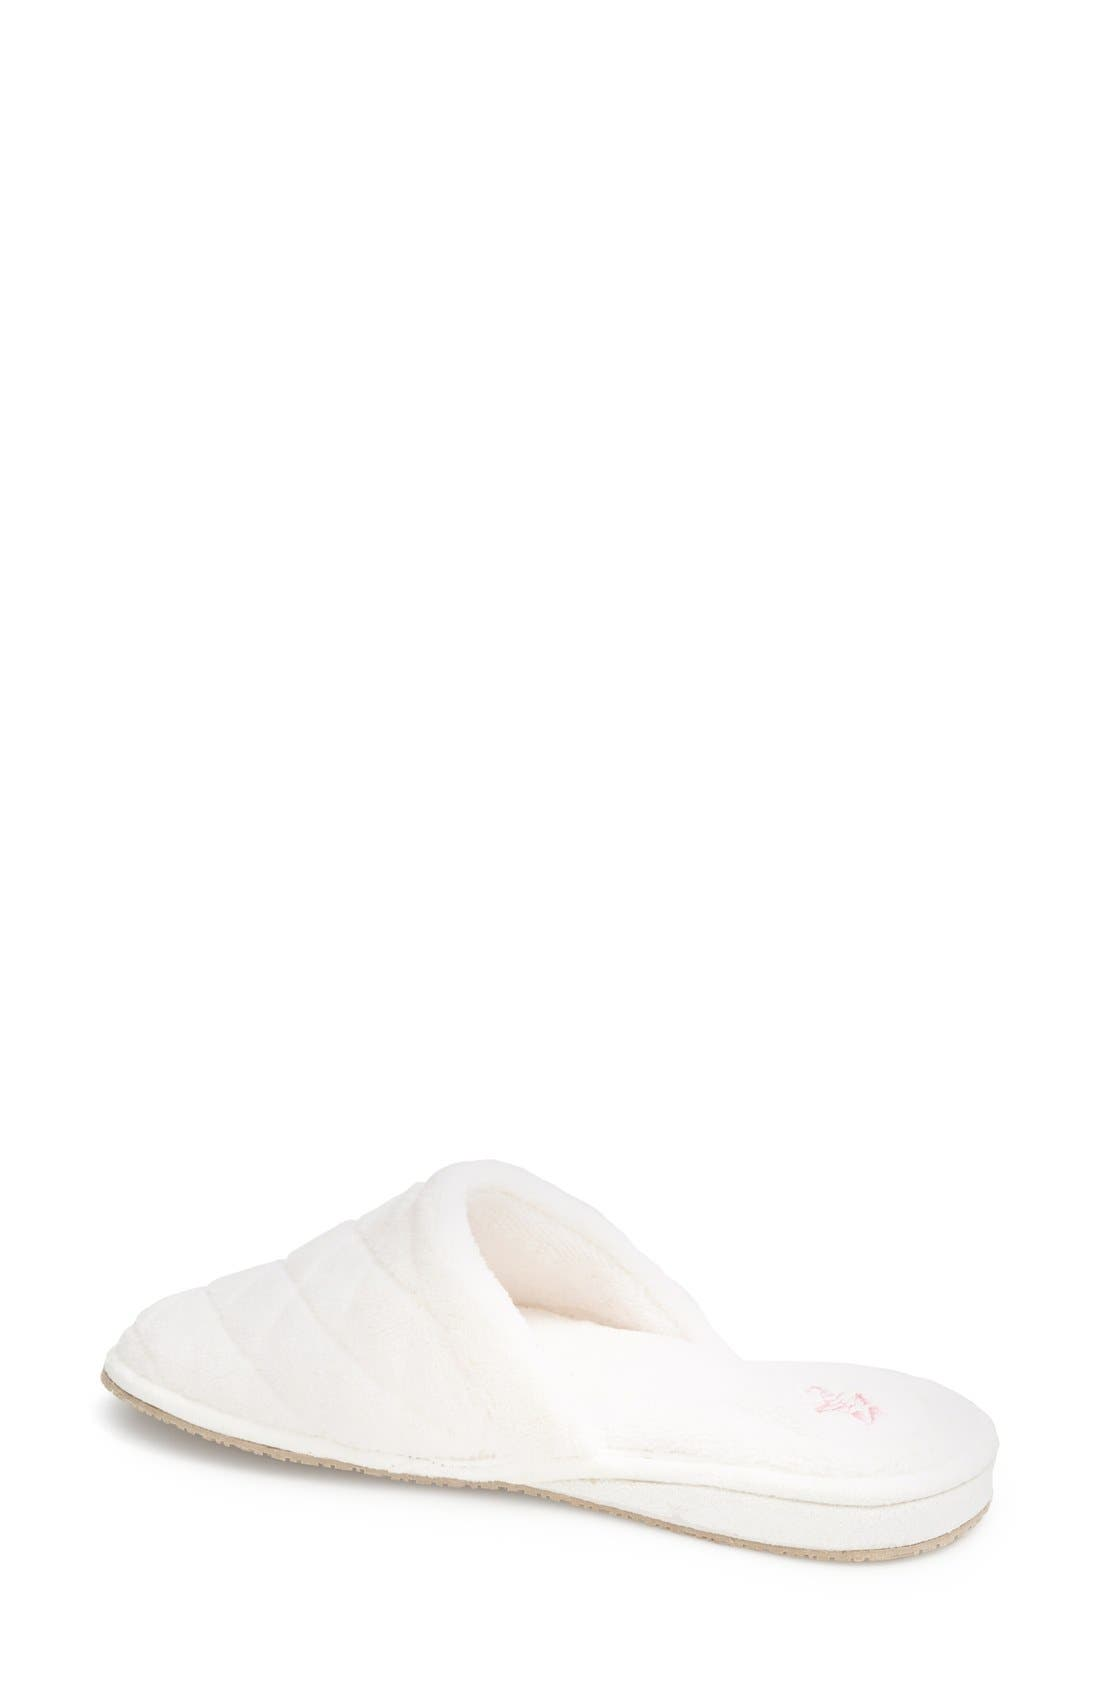 'Aria' Plush Slipper,                             Alternate thumbnail 2, color,                             White Polyester